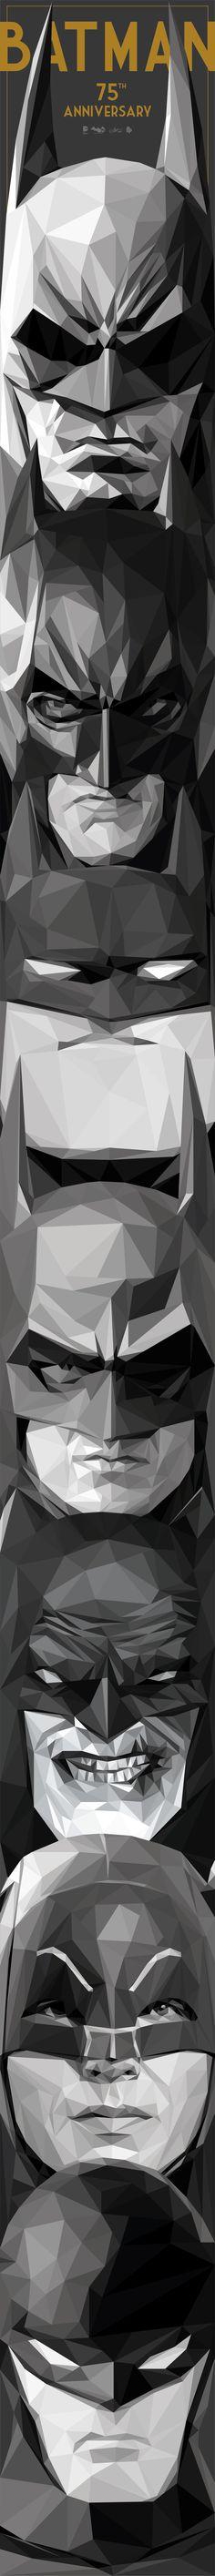 """Bat-Totem"" by Simon Delart. Batman 75th Anniversary artwork. // From Bottom to top: 1) Bill Finger / Bob Kane – 2) Adam West – 3) Frank Miller – 4) Tim Burton / Michael Keaton – 5) Bruce Timm / The Animated Series – 6) Christopher Nolan / Christian Bale – 7) Batman Arkham video games."